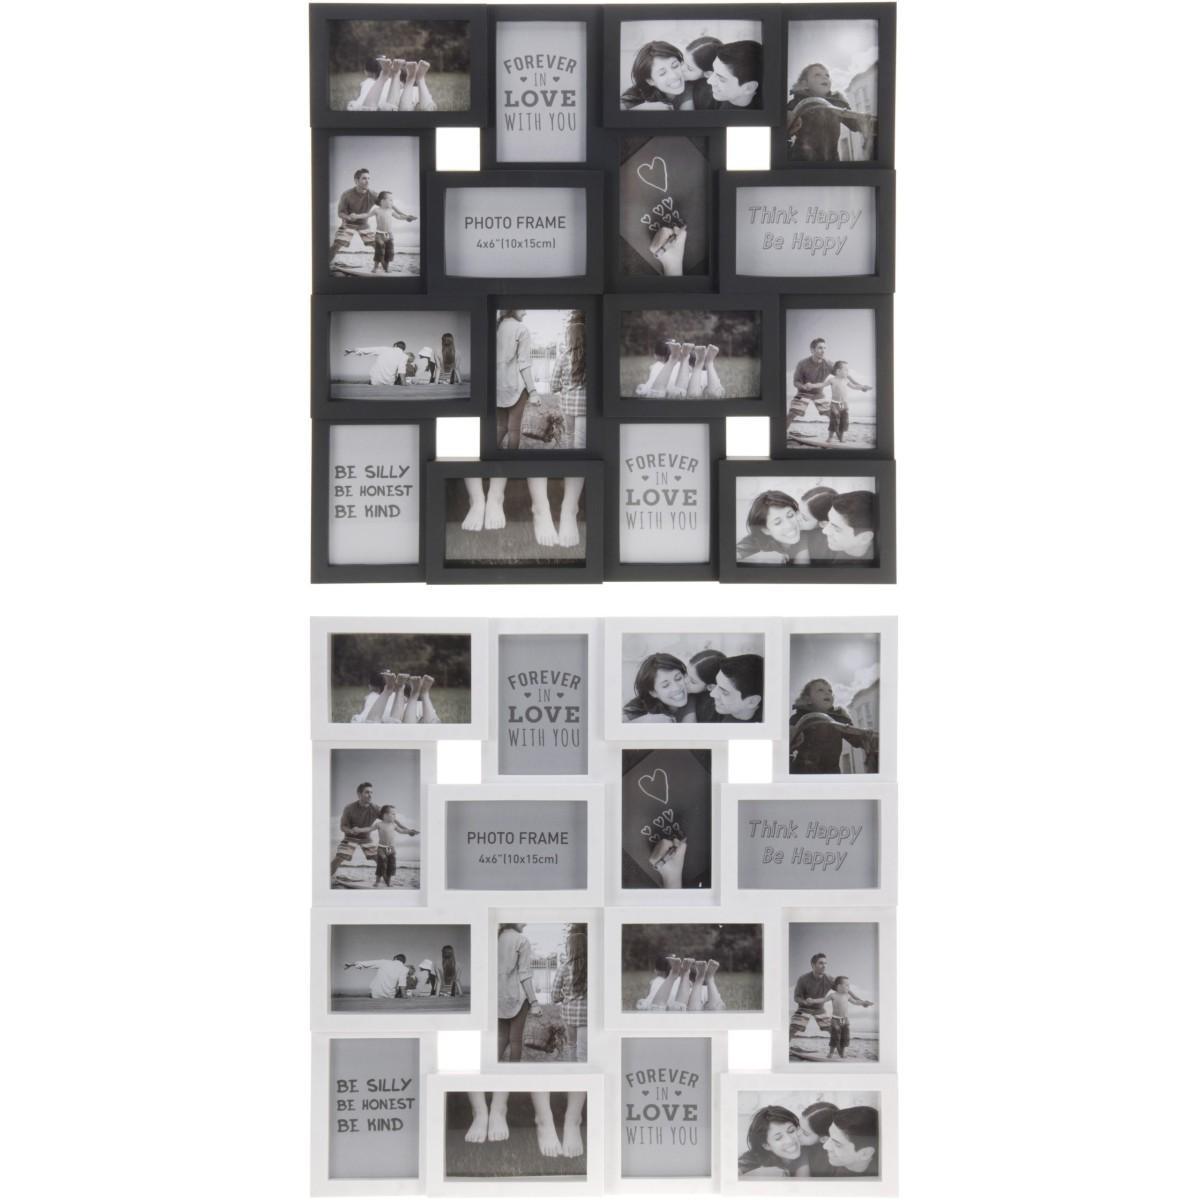 fotorahmen bilderrahmen 56 5x56 5cm 16fotos kunststoff multirahmen fotogalerie. Black Bedroom Furniture Sets. Home Design Ideas